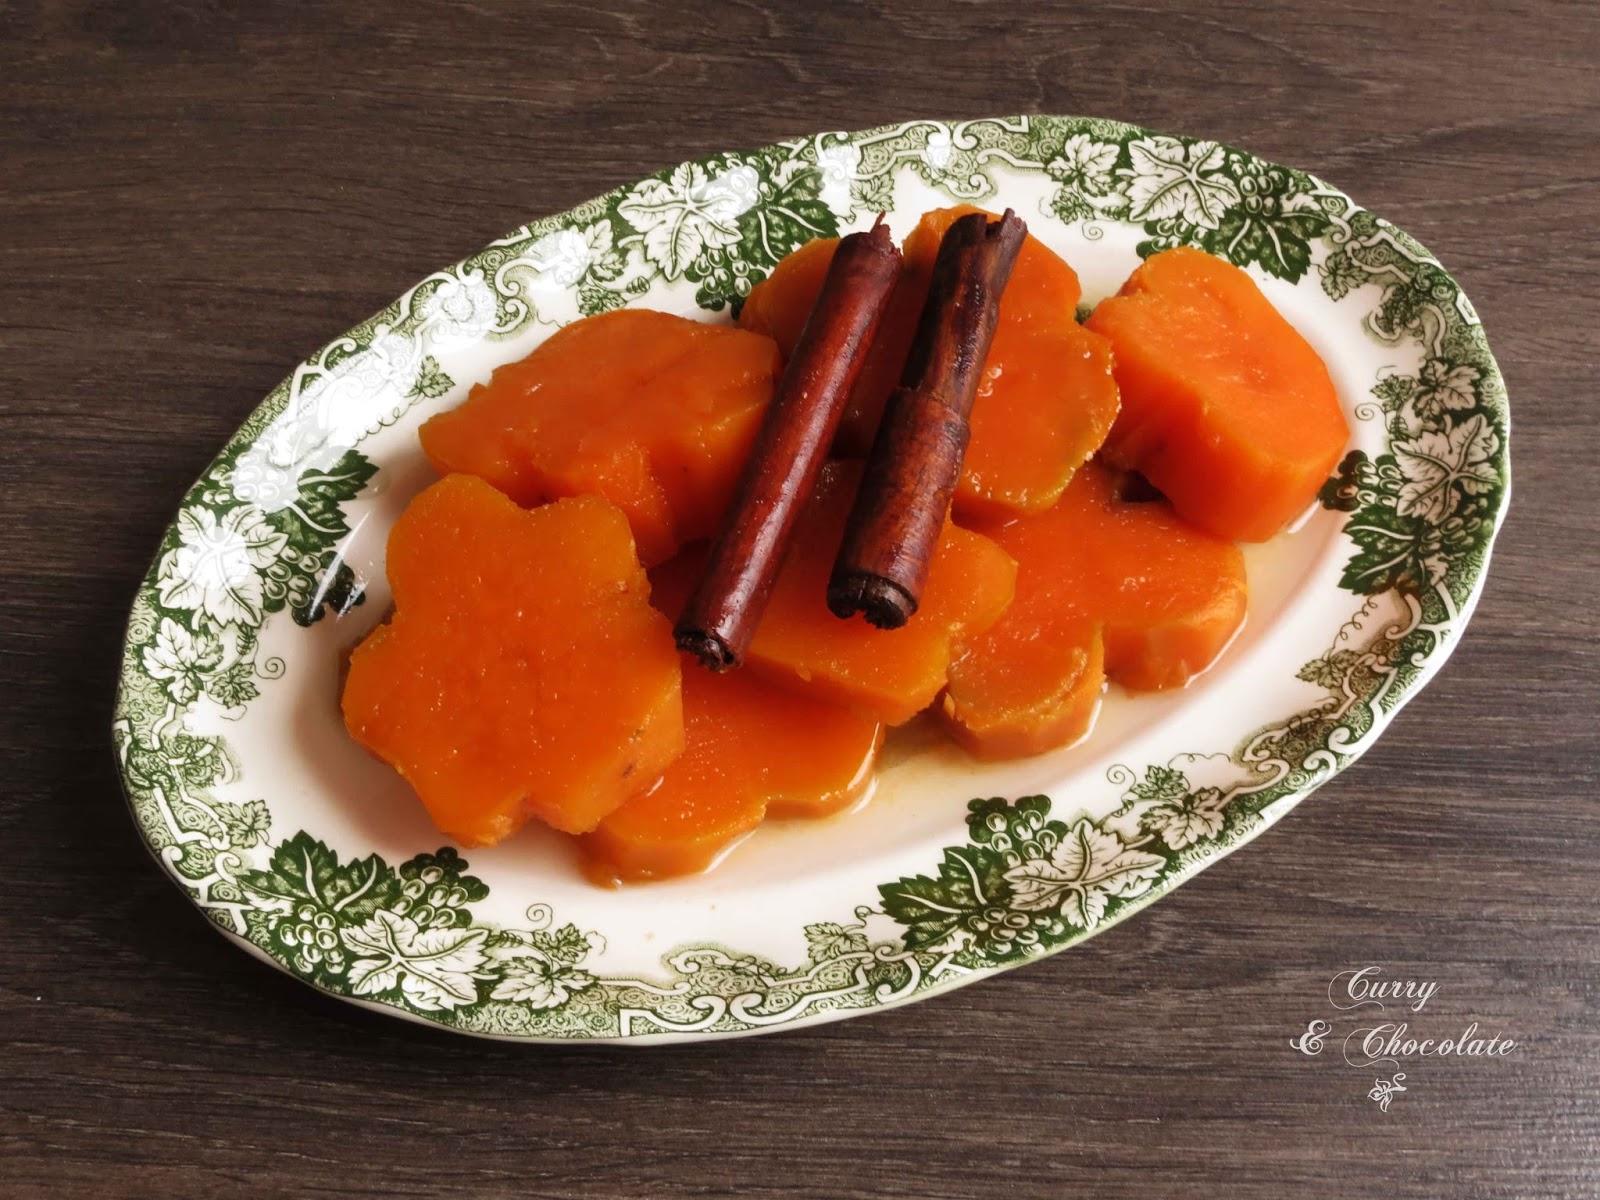 Batatas o boniatos en dulce